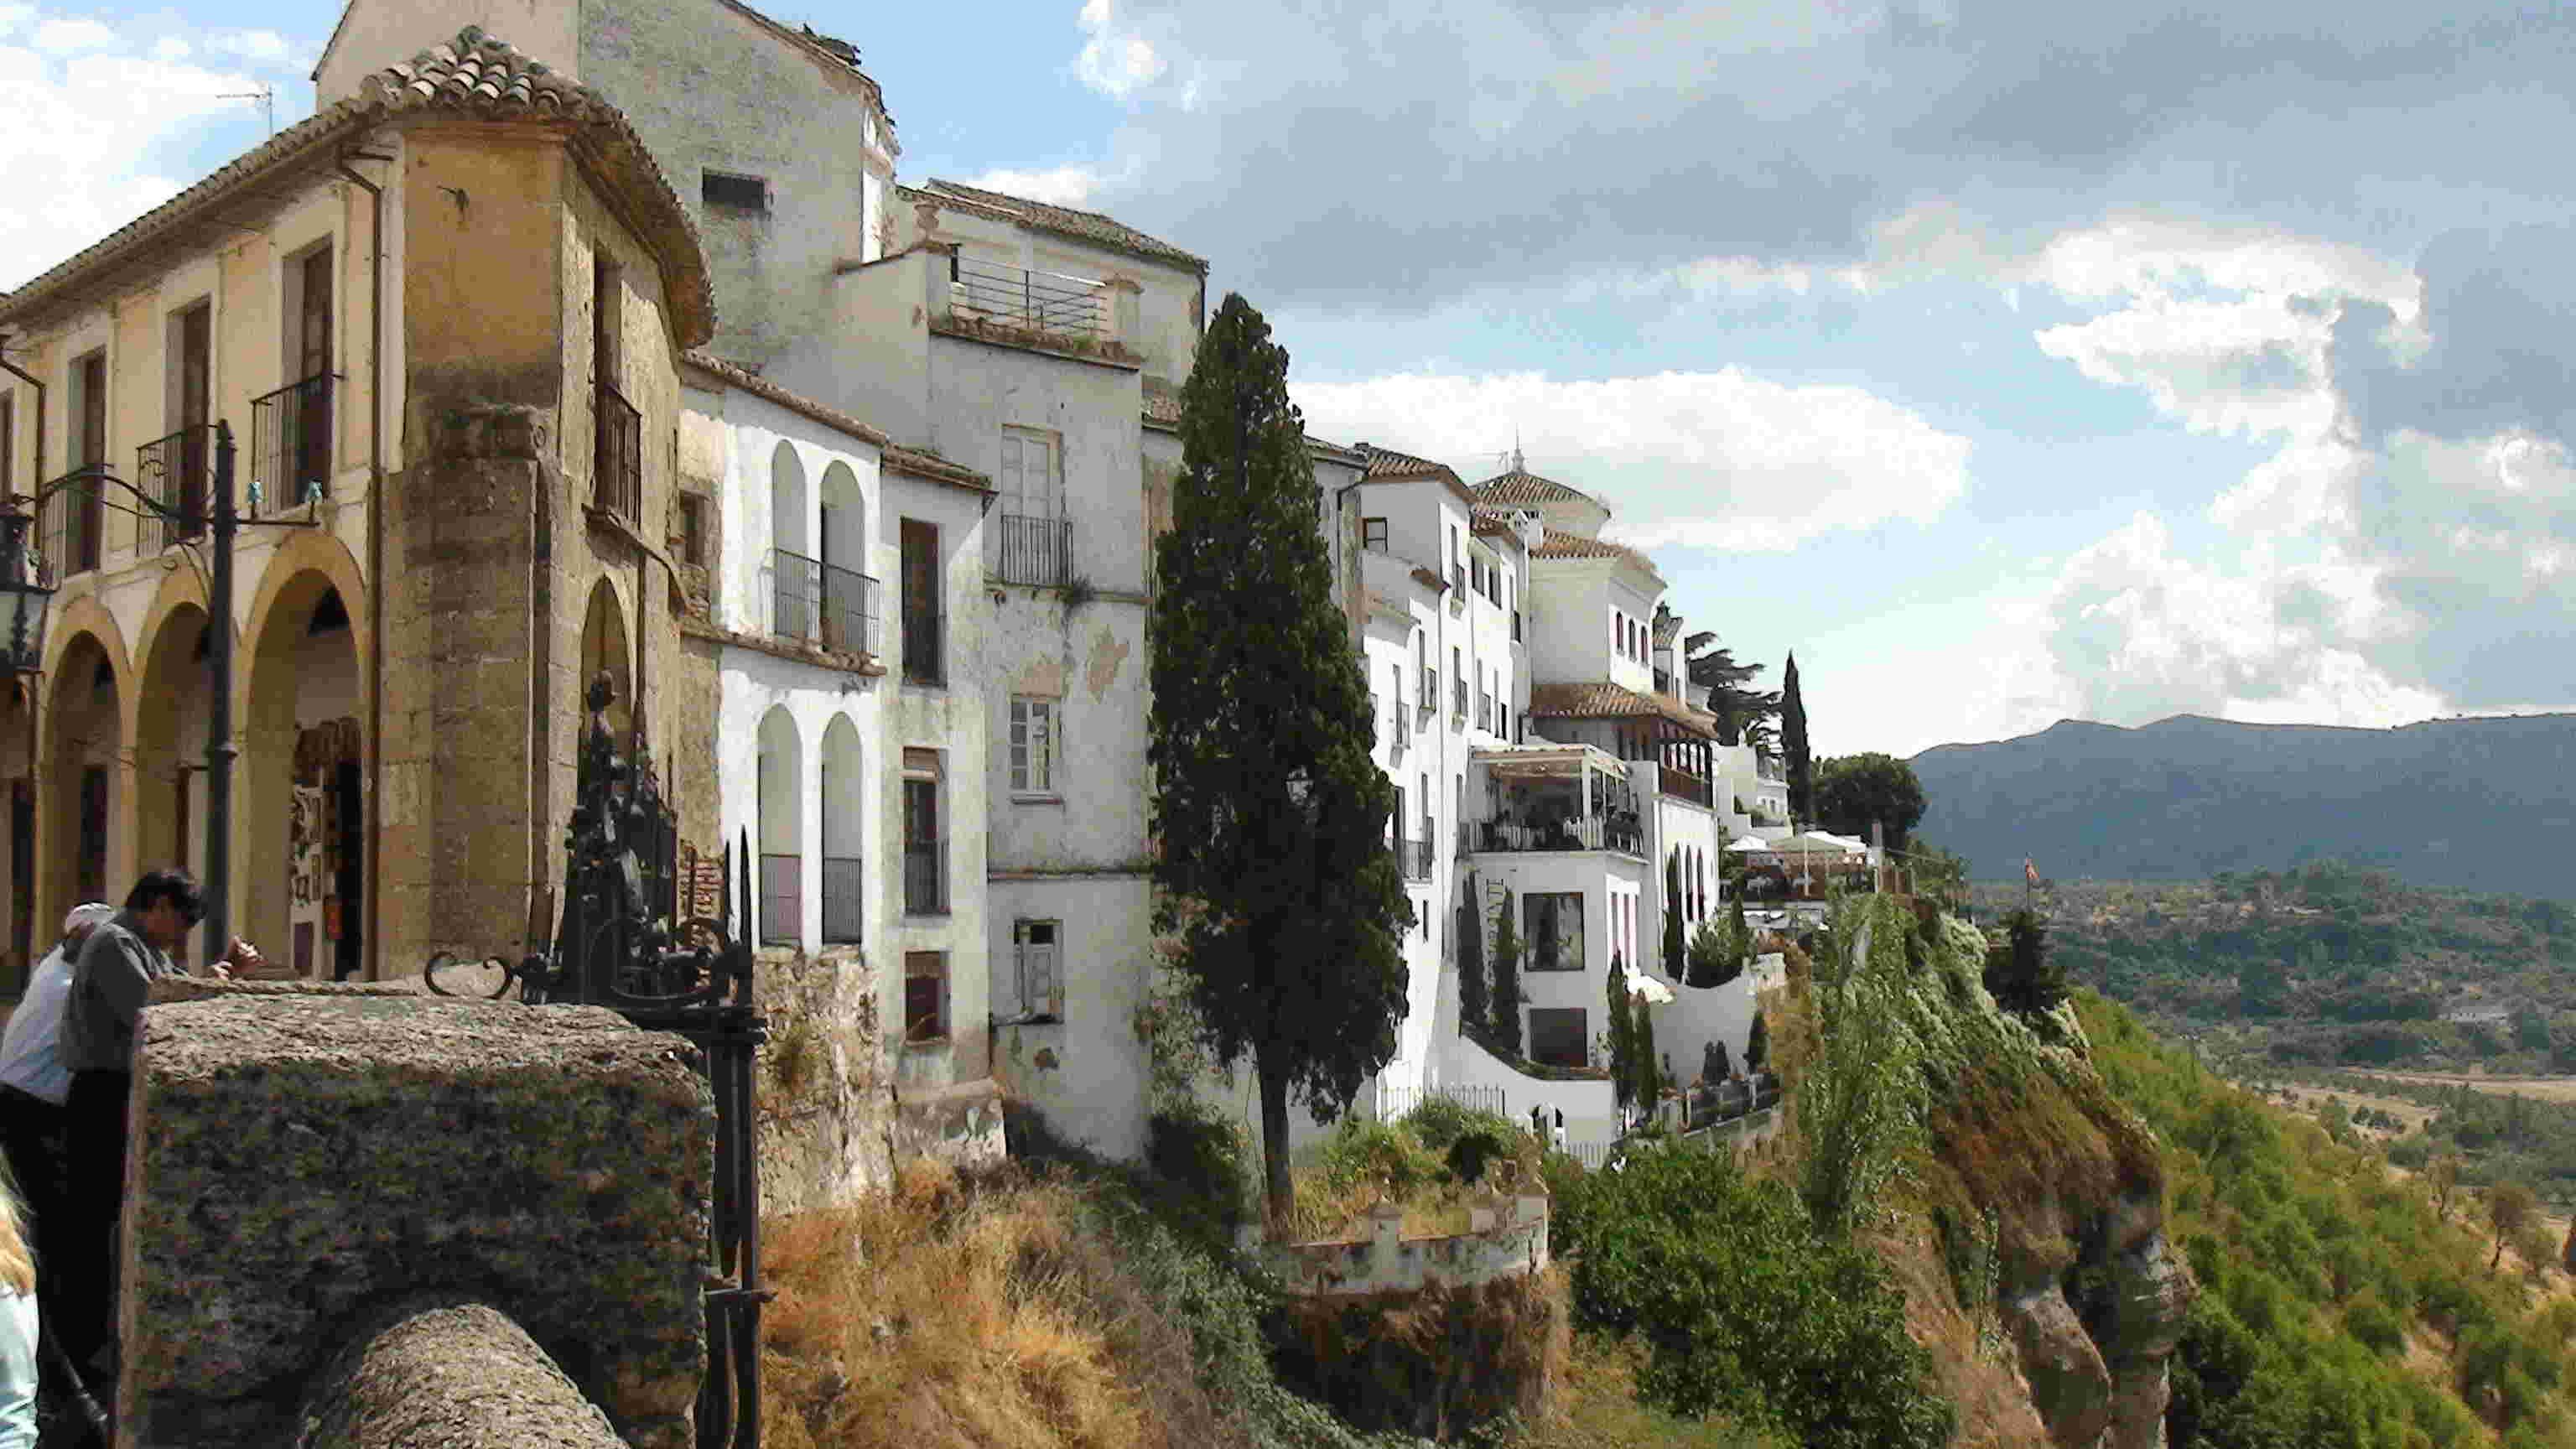 Ronda, village au bord d'un précipice - Espagne. Ronda111